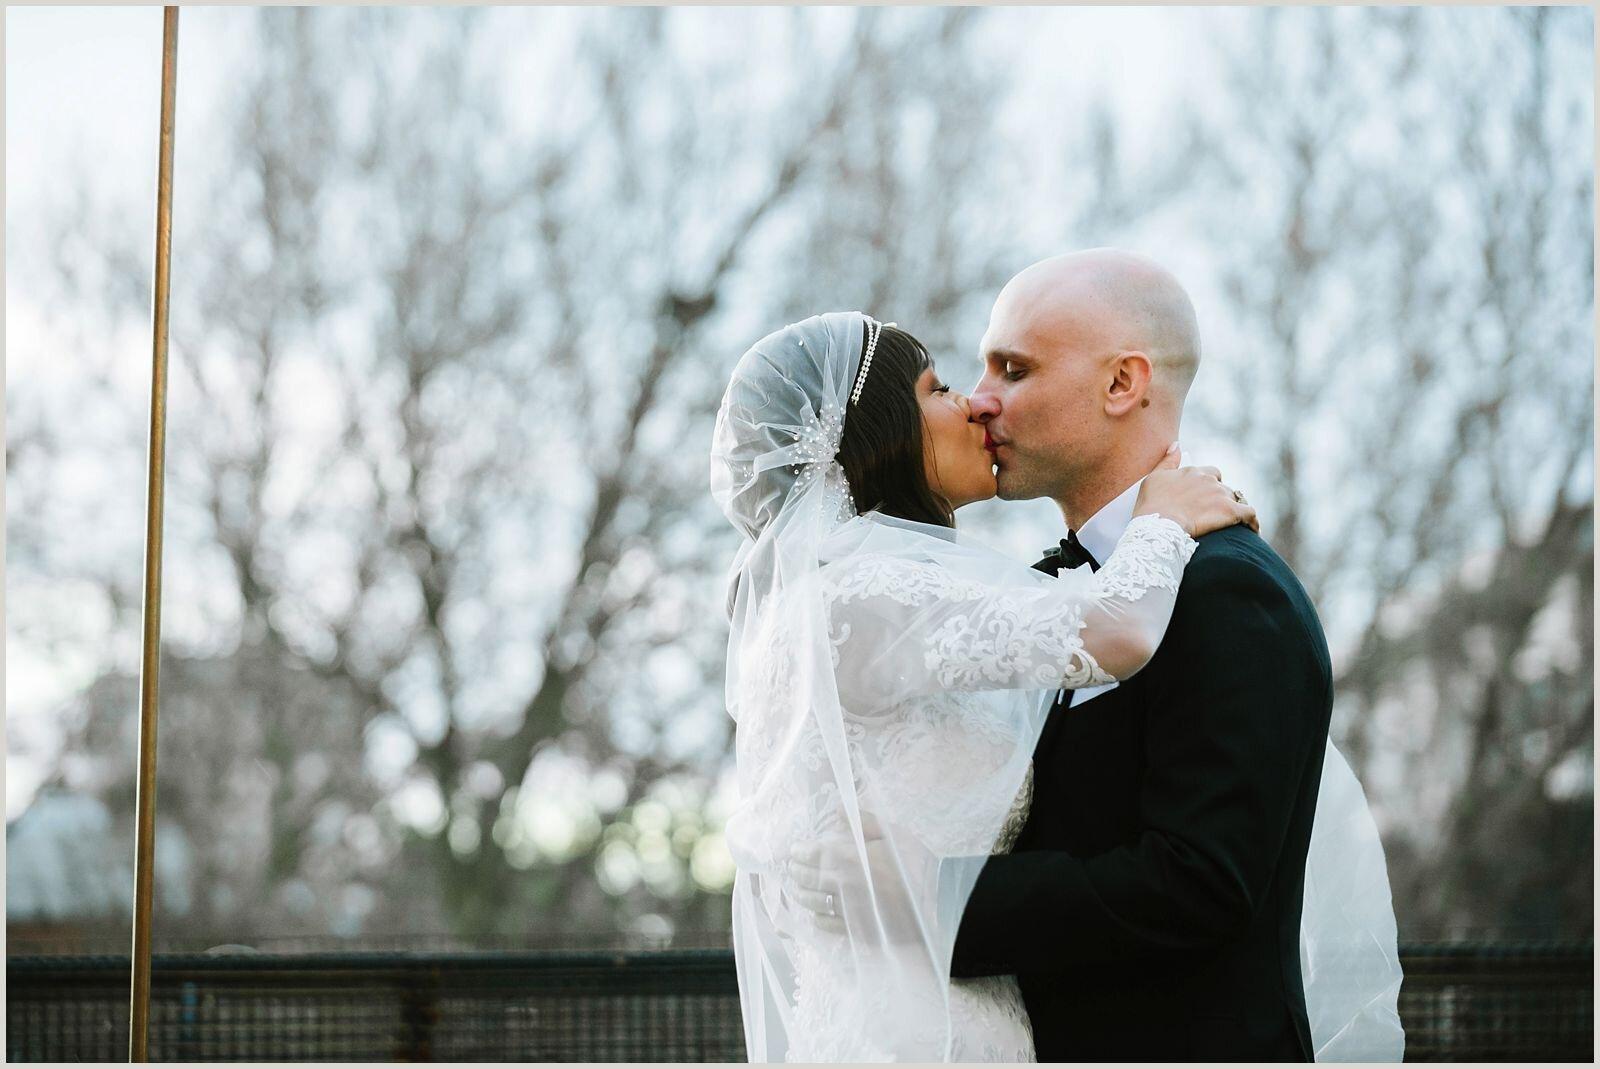 joseph_koprek_wedding_melbourne_the_prince_deck_0064.jpg